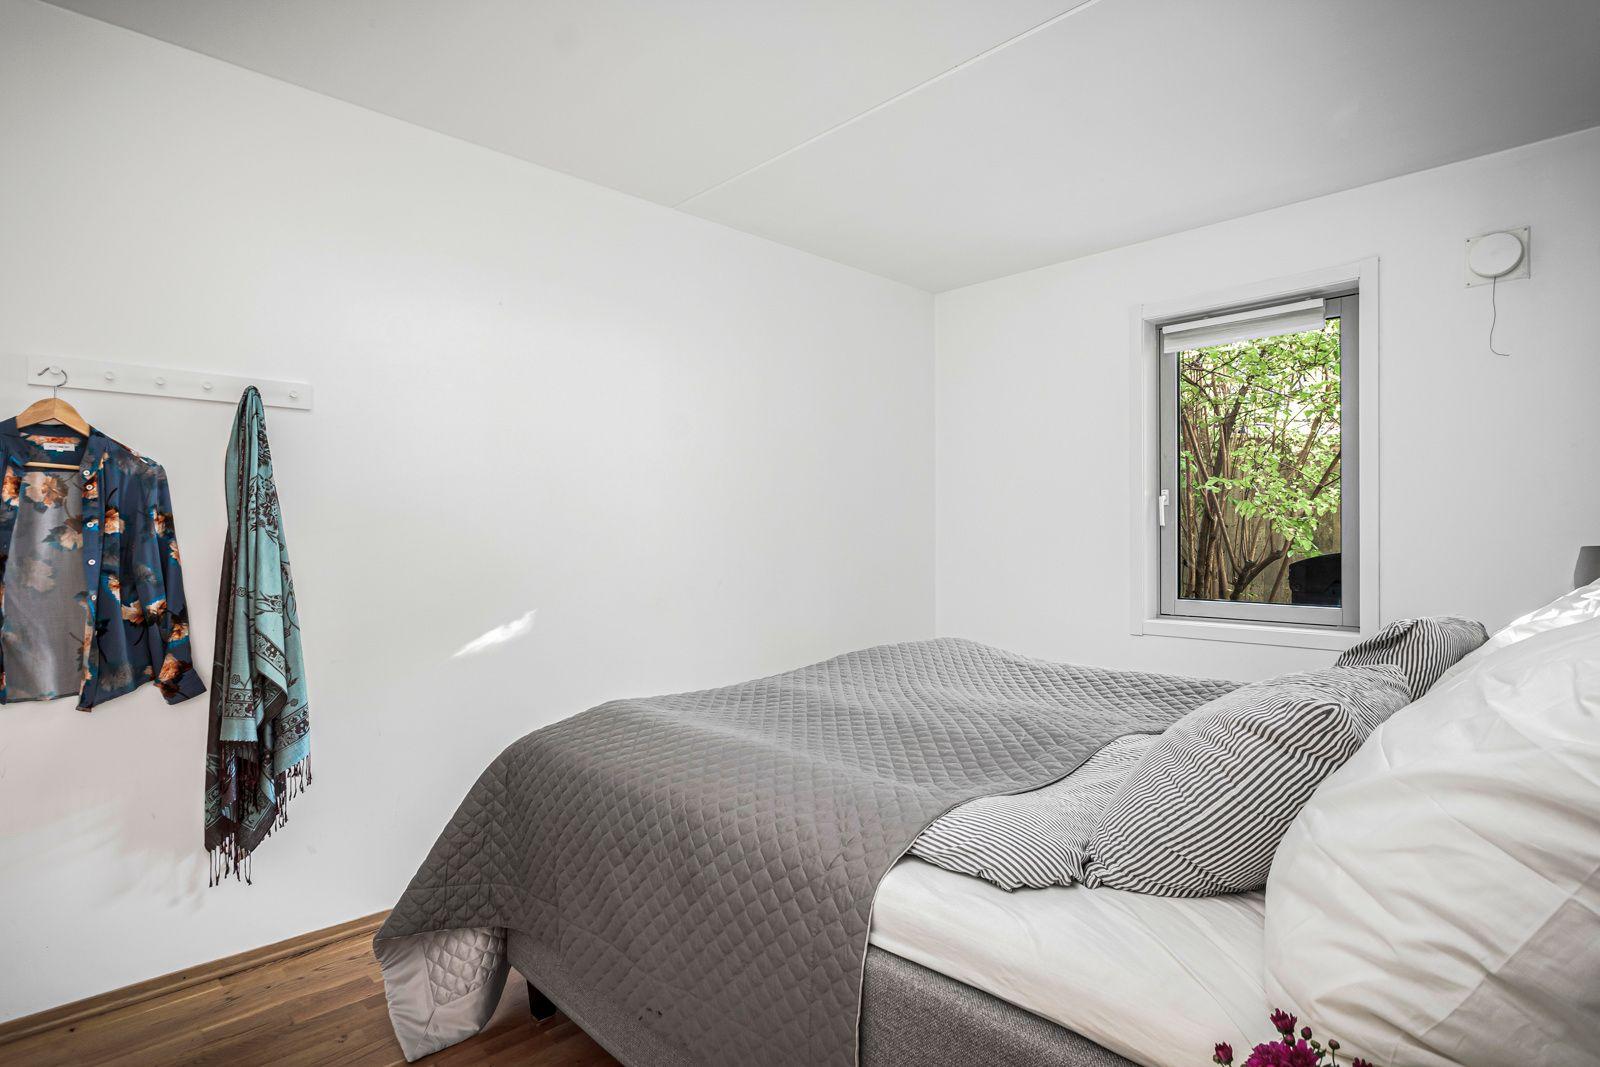 Alnagata 20B Soverommet har god plass til dobbeltseng, nattbord på hver side og øvrig møblement.